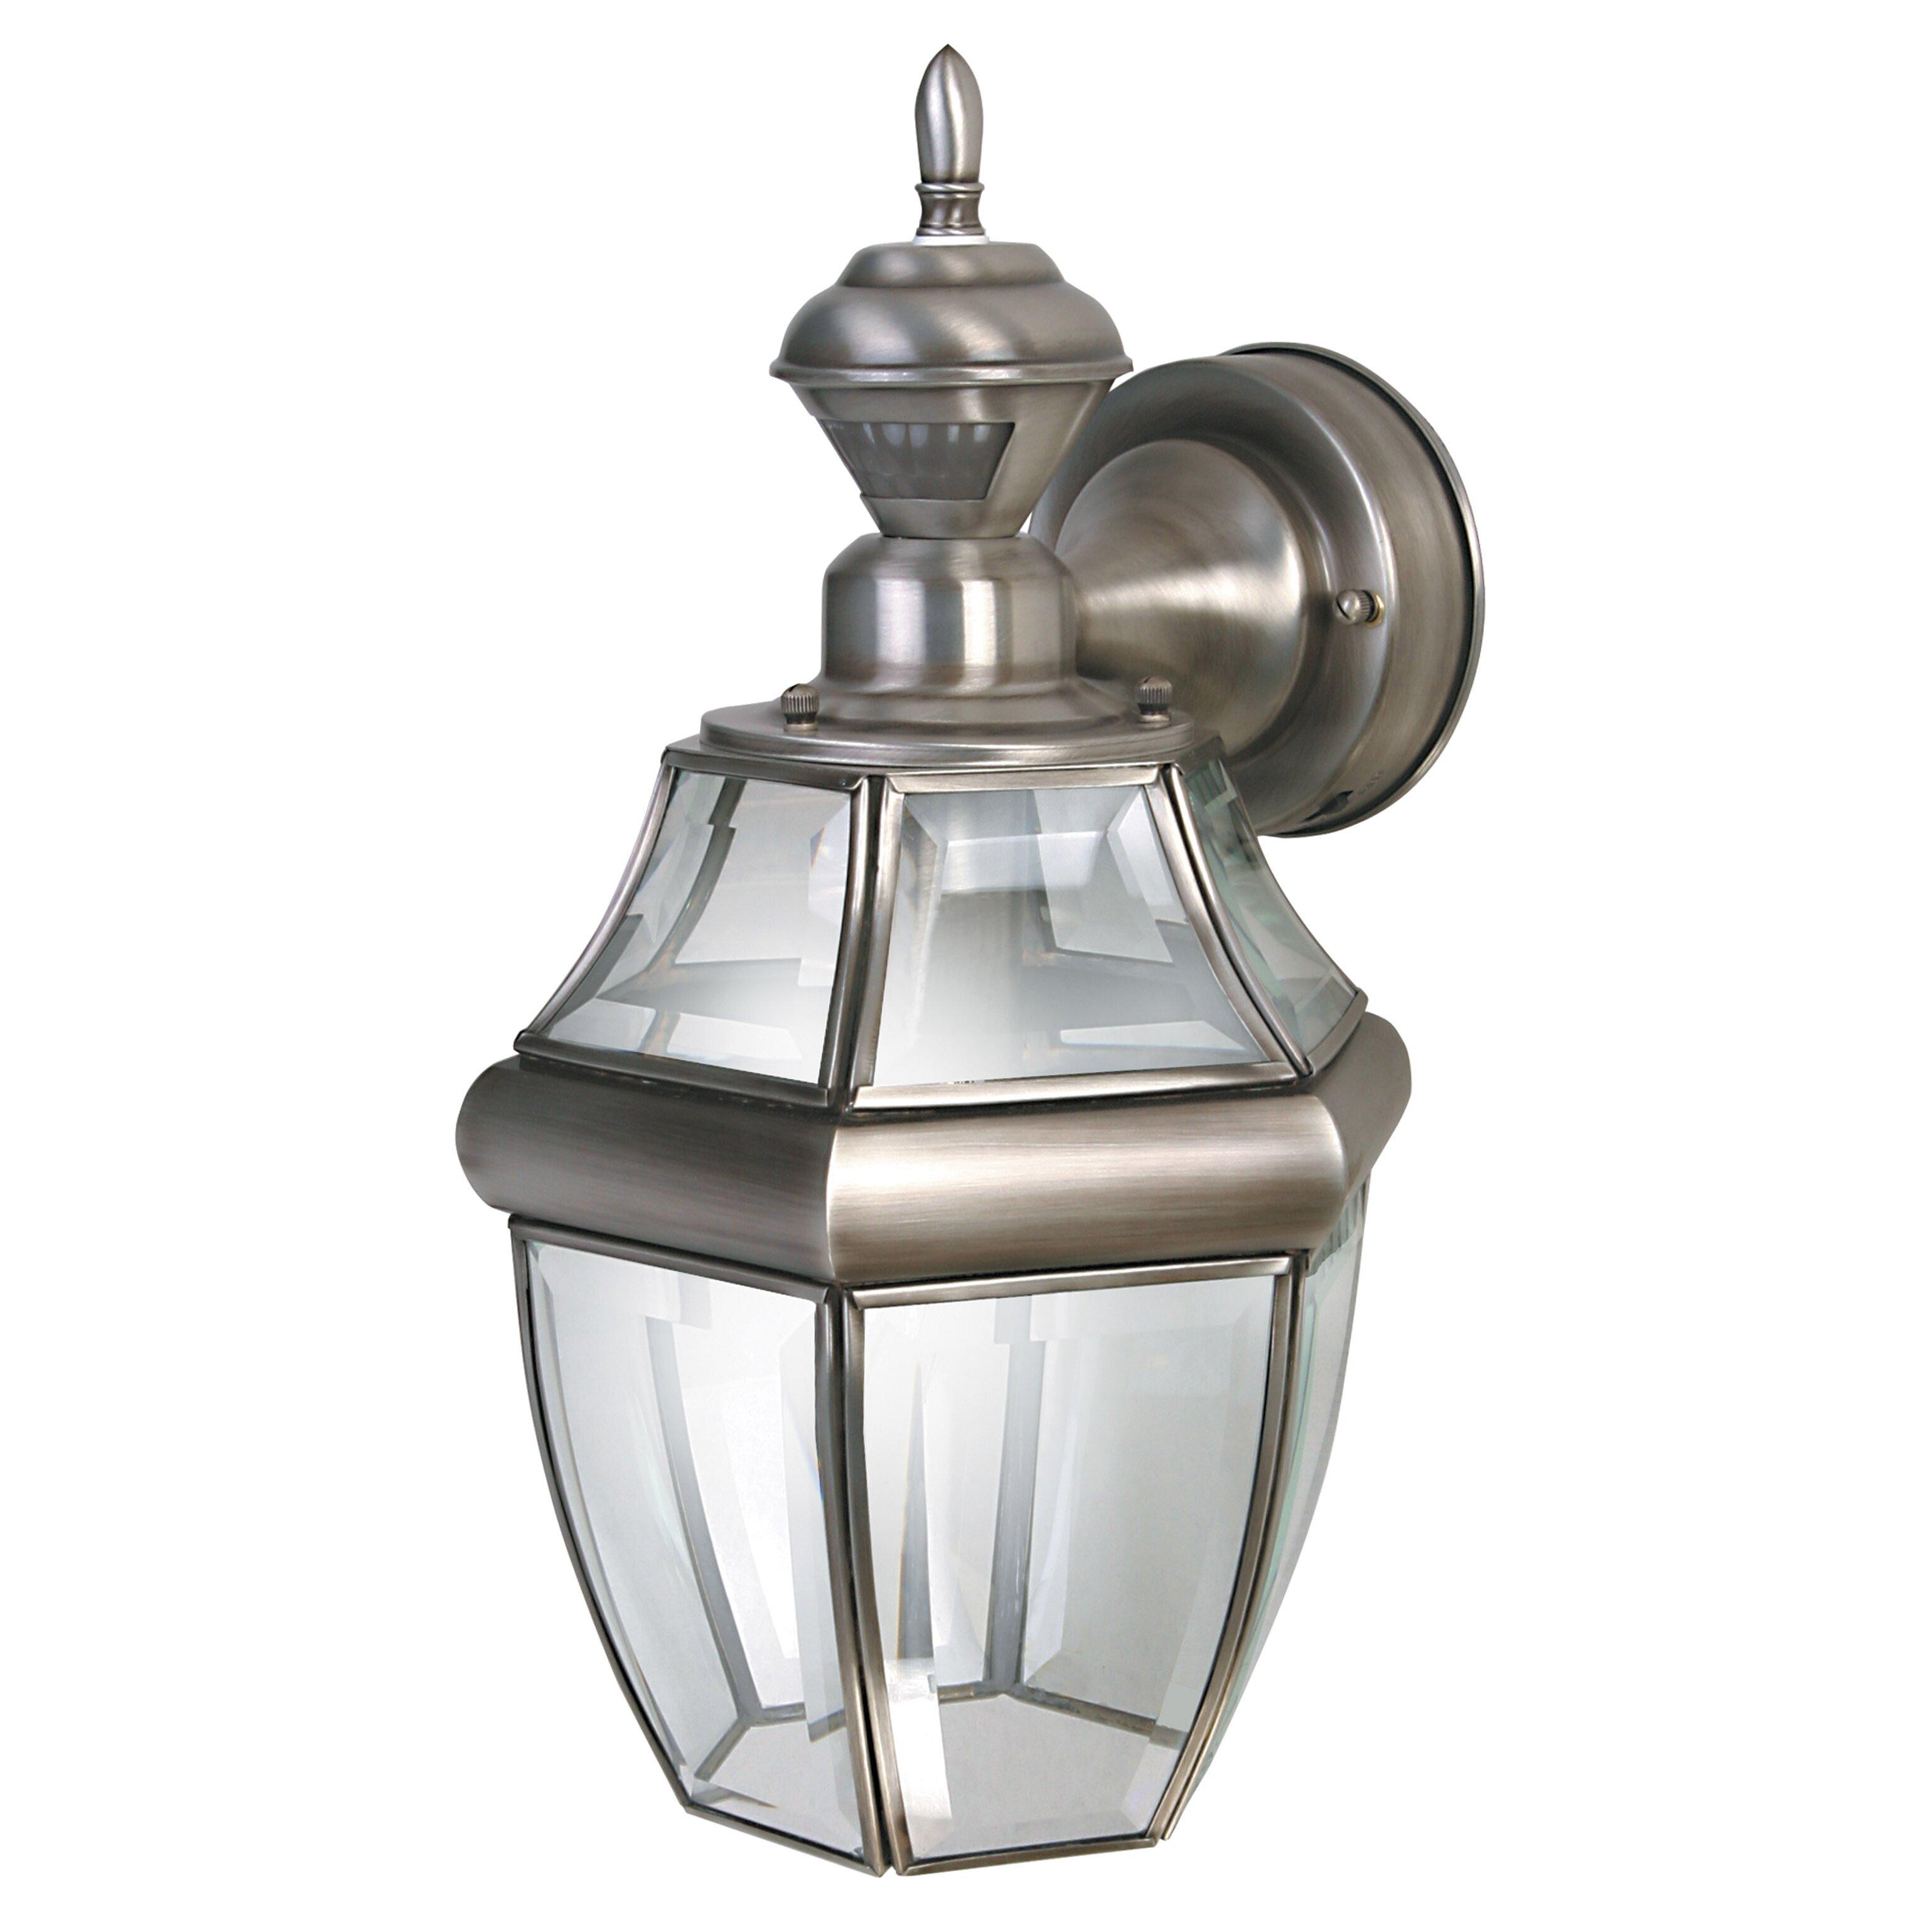 lighting lantern outdoor wall lighting heath zenith sku heh1090. Black Bedroom Furniture Sets. Home Design Ideas